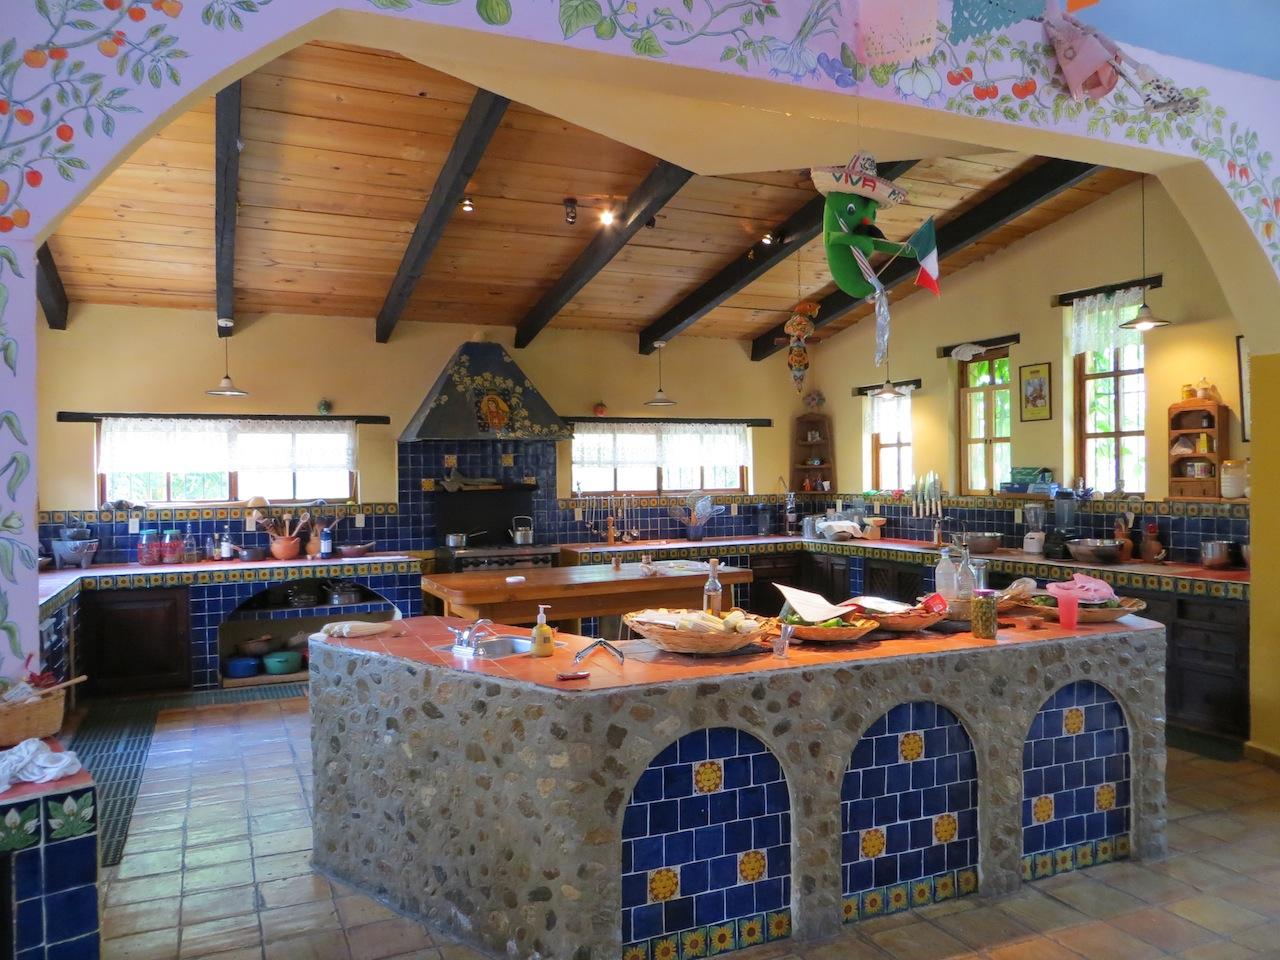 Five cooking classes to try in oaxaca the mija chronicles - Decoracion de cocinas rusticas ...